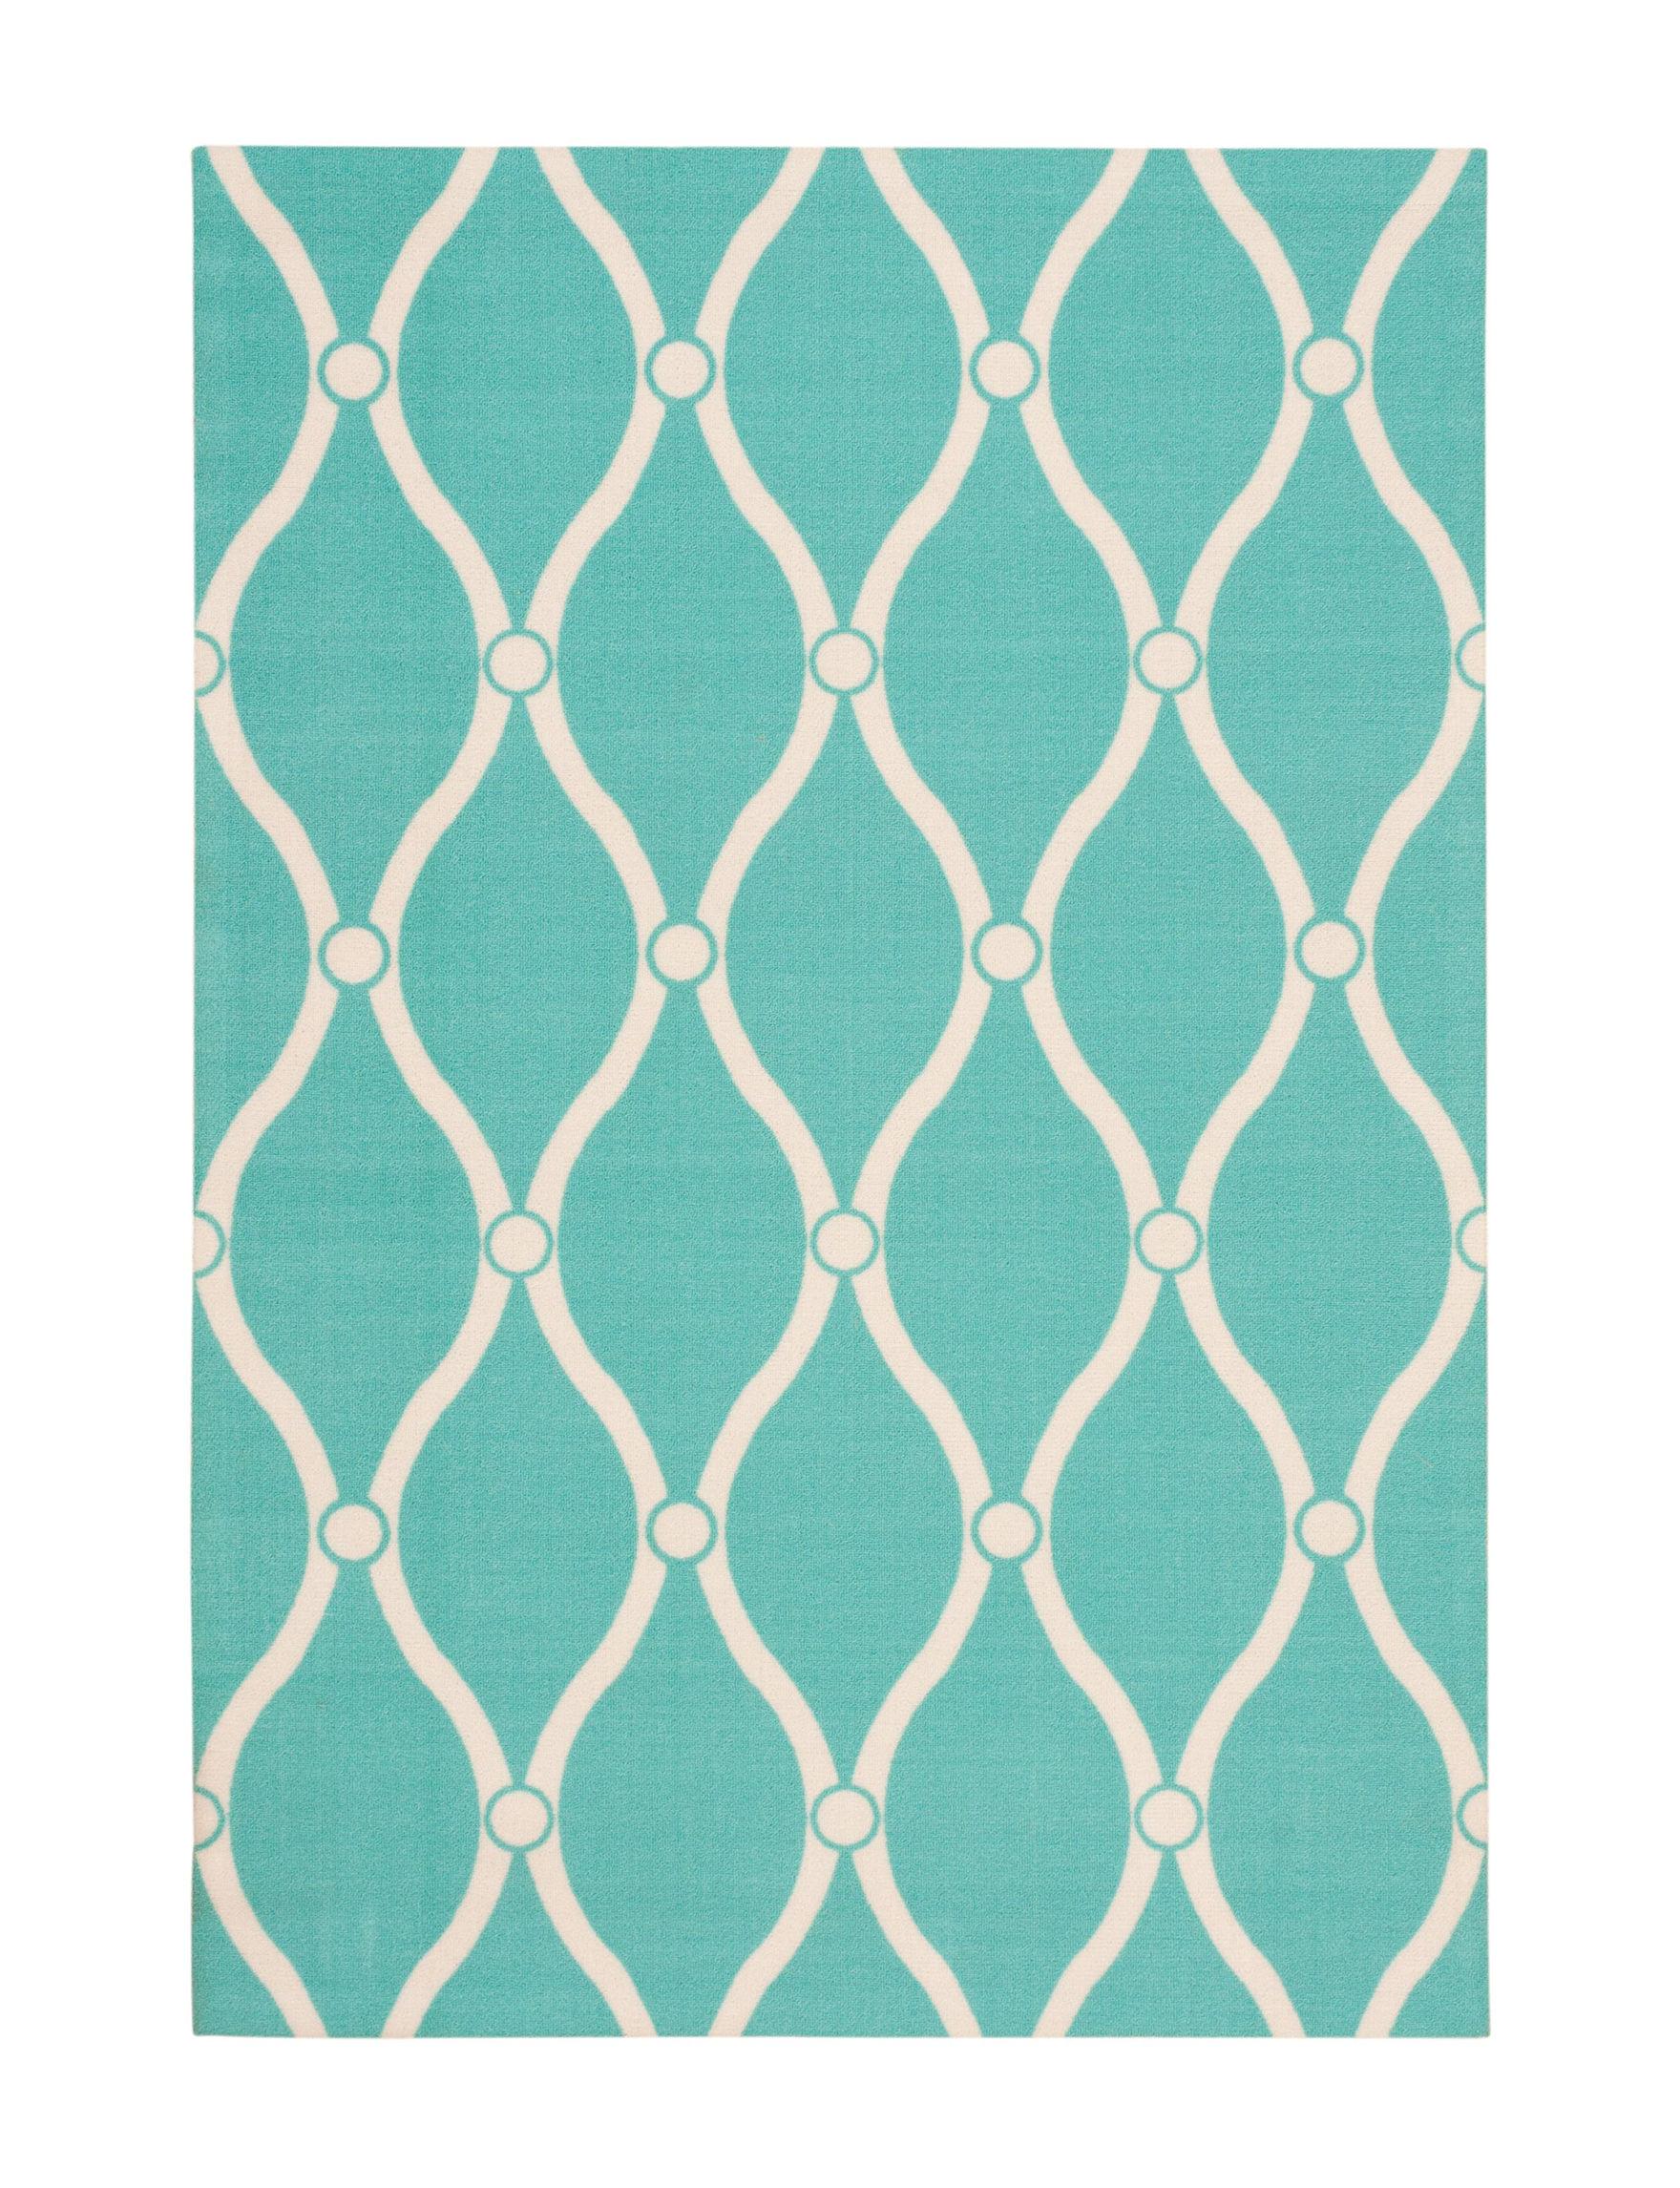 Nourison Aqua Accent Rugs Area Rugs Outdoor Rugs & Doormats Outdoor Decor Rugs